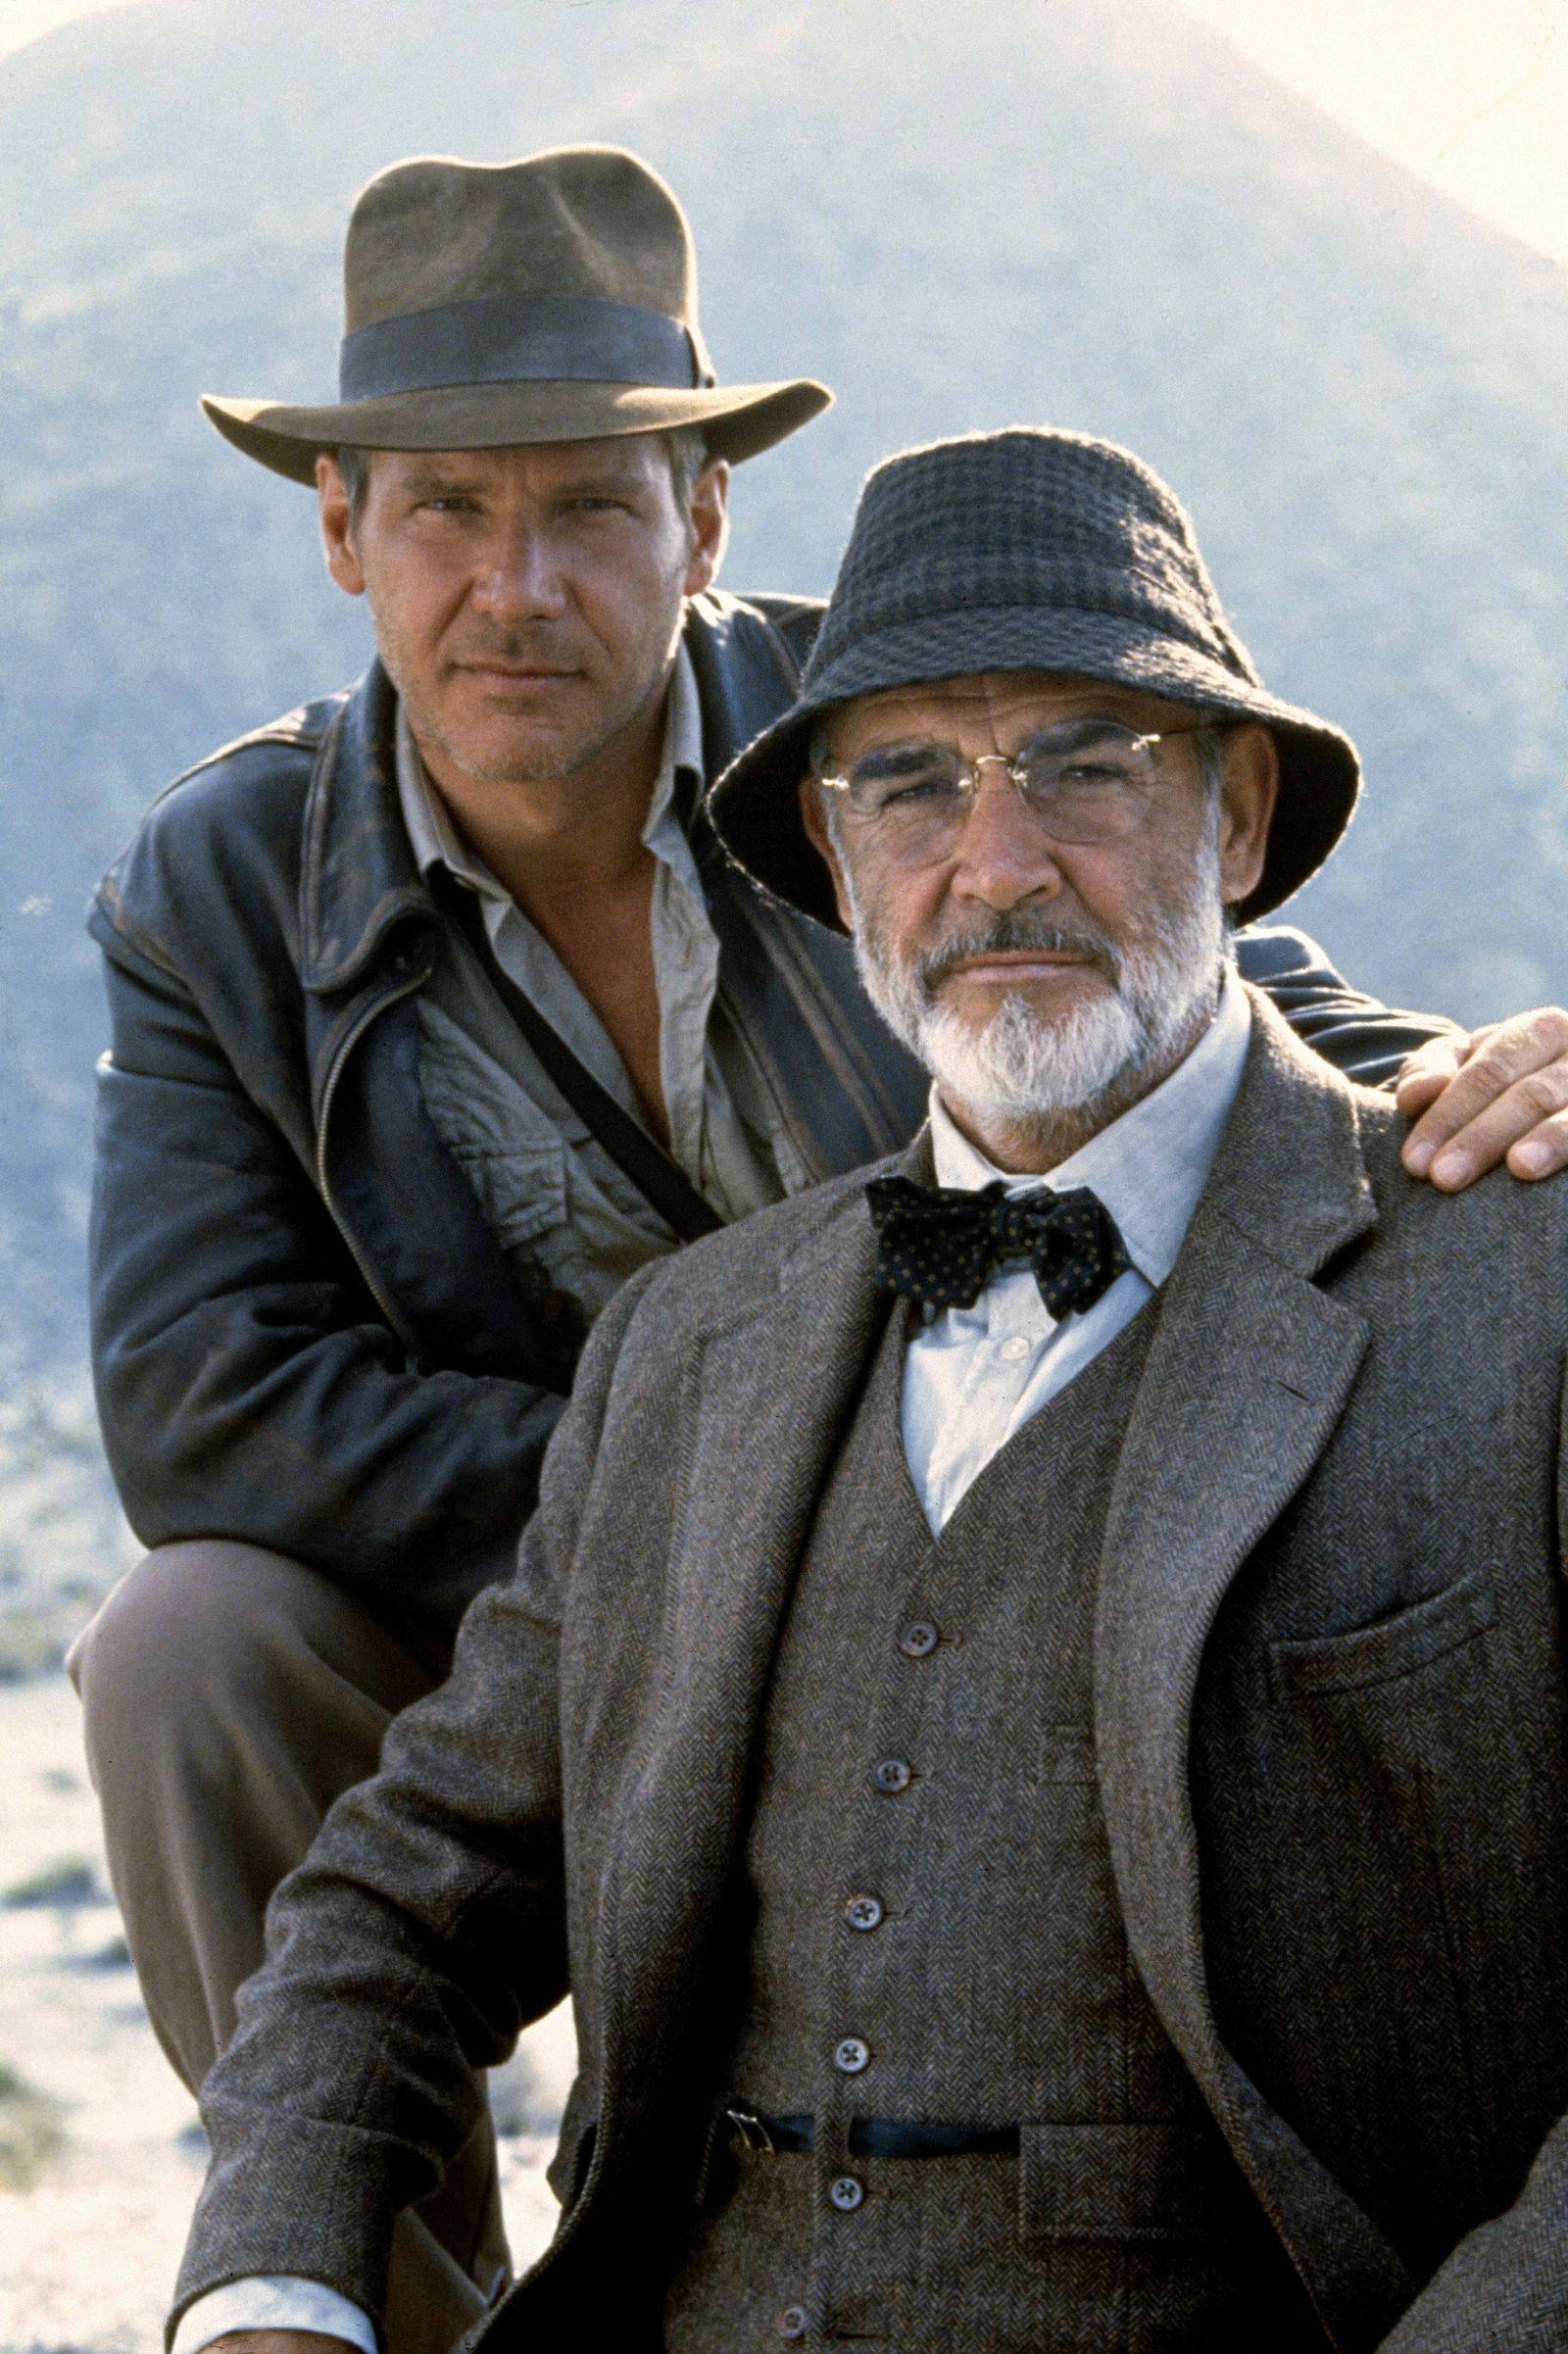 Harrison Ford & Sean Connery Characters: Indiana Jones, Professor Henry Jones Film: Indiana Jones And The Last Crusade